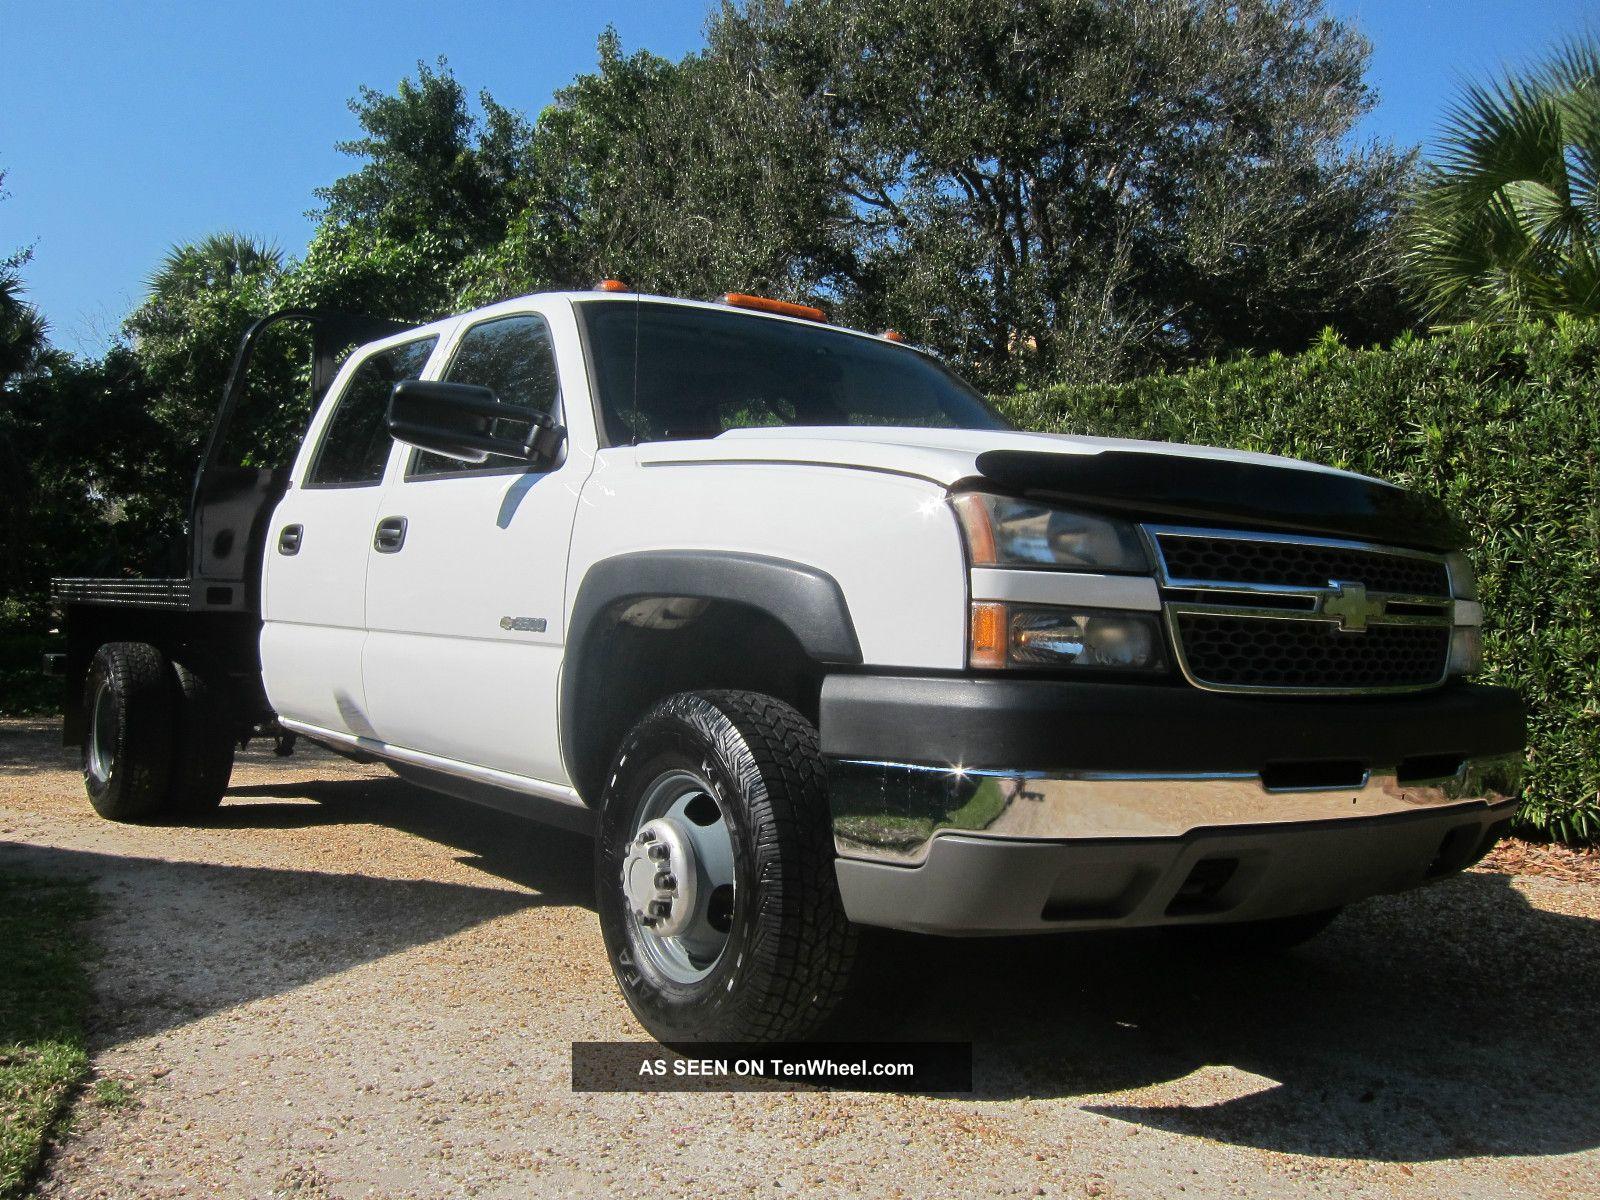 2005 Chevy 3500 Crew Cab 4x4 4wd Flatbed Florida Make Offer Silverado 3500 photo